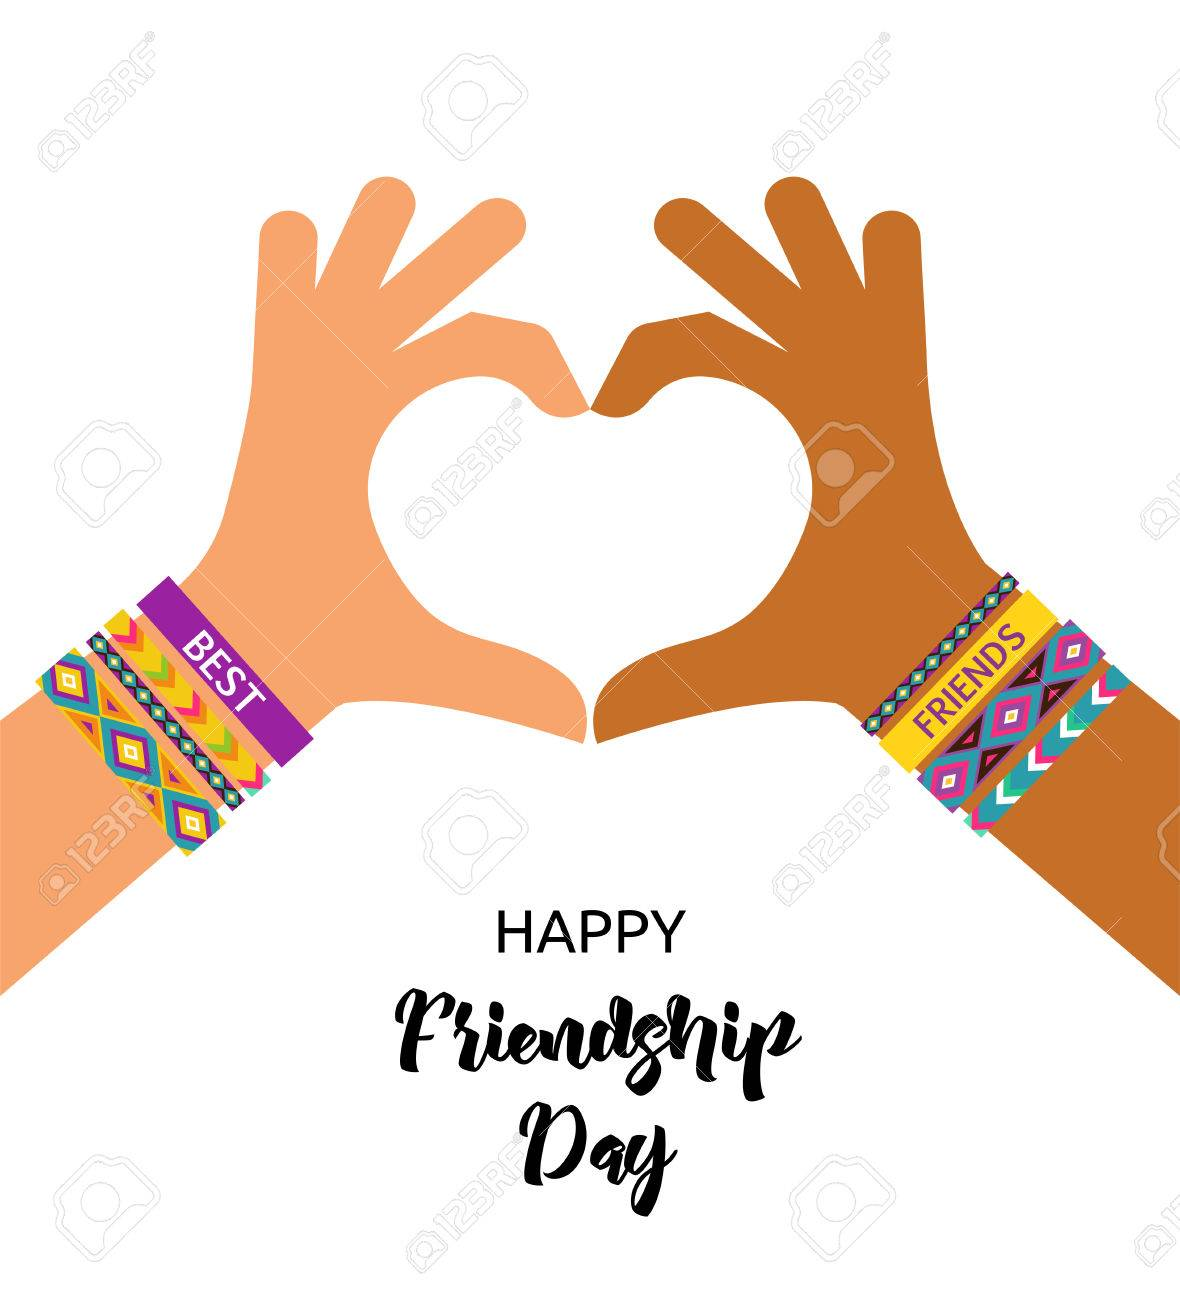 Best friends forever happy friendship day poster design banner best friends forever happy friendship day poster design banner greeting card stock vector m4hsunfo Gallery